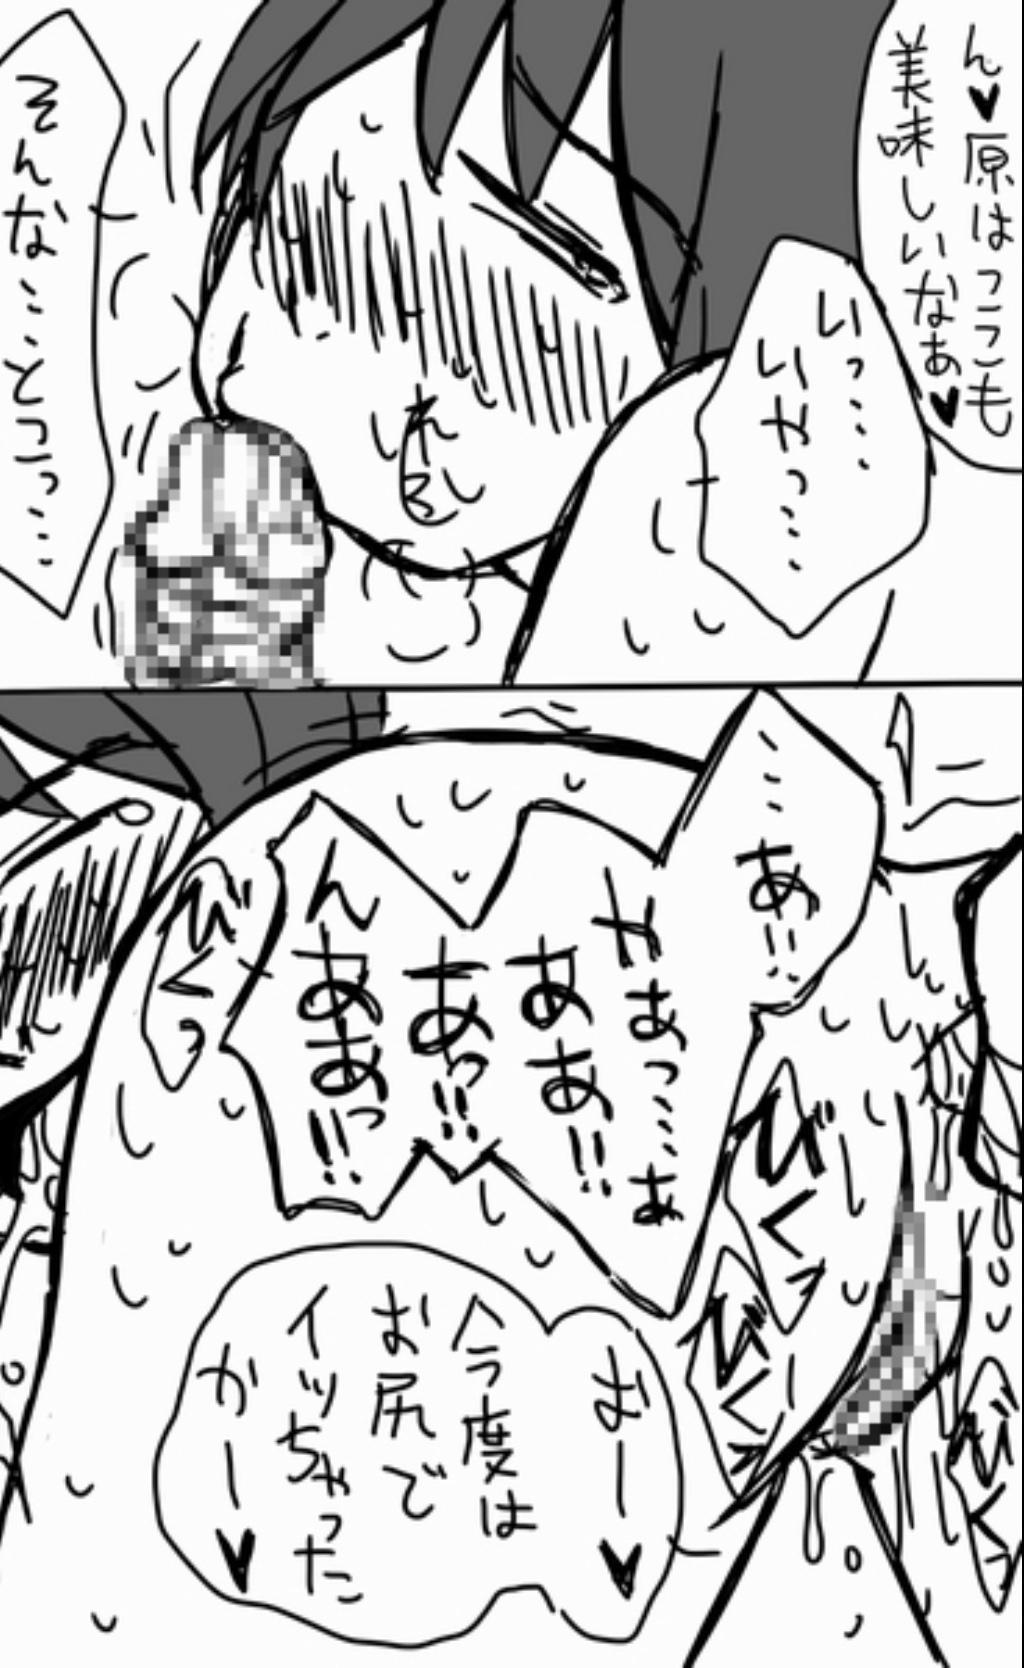 Assassination Classroom Story About Takaoka Marrying Hazama And Hara 2 19